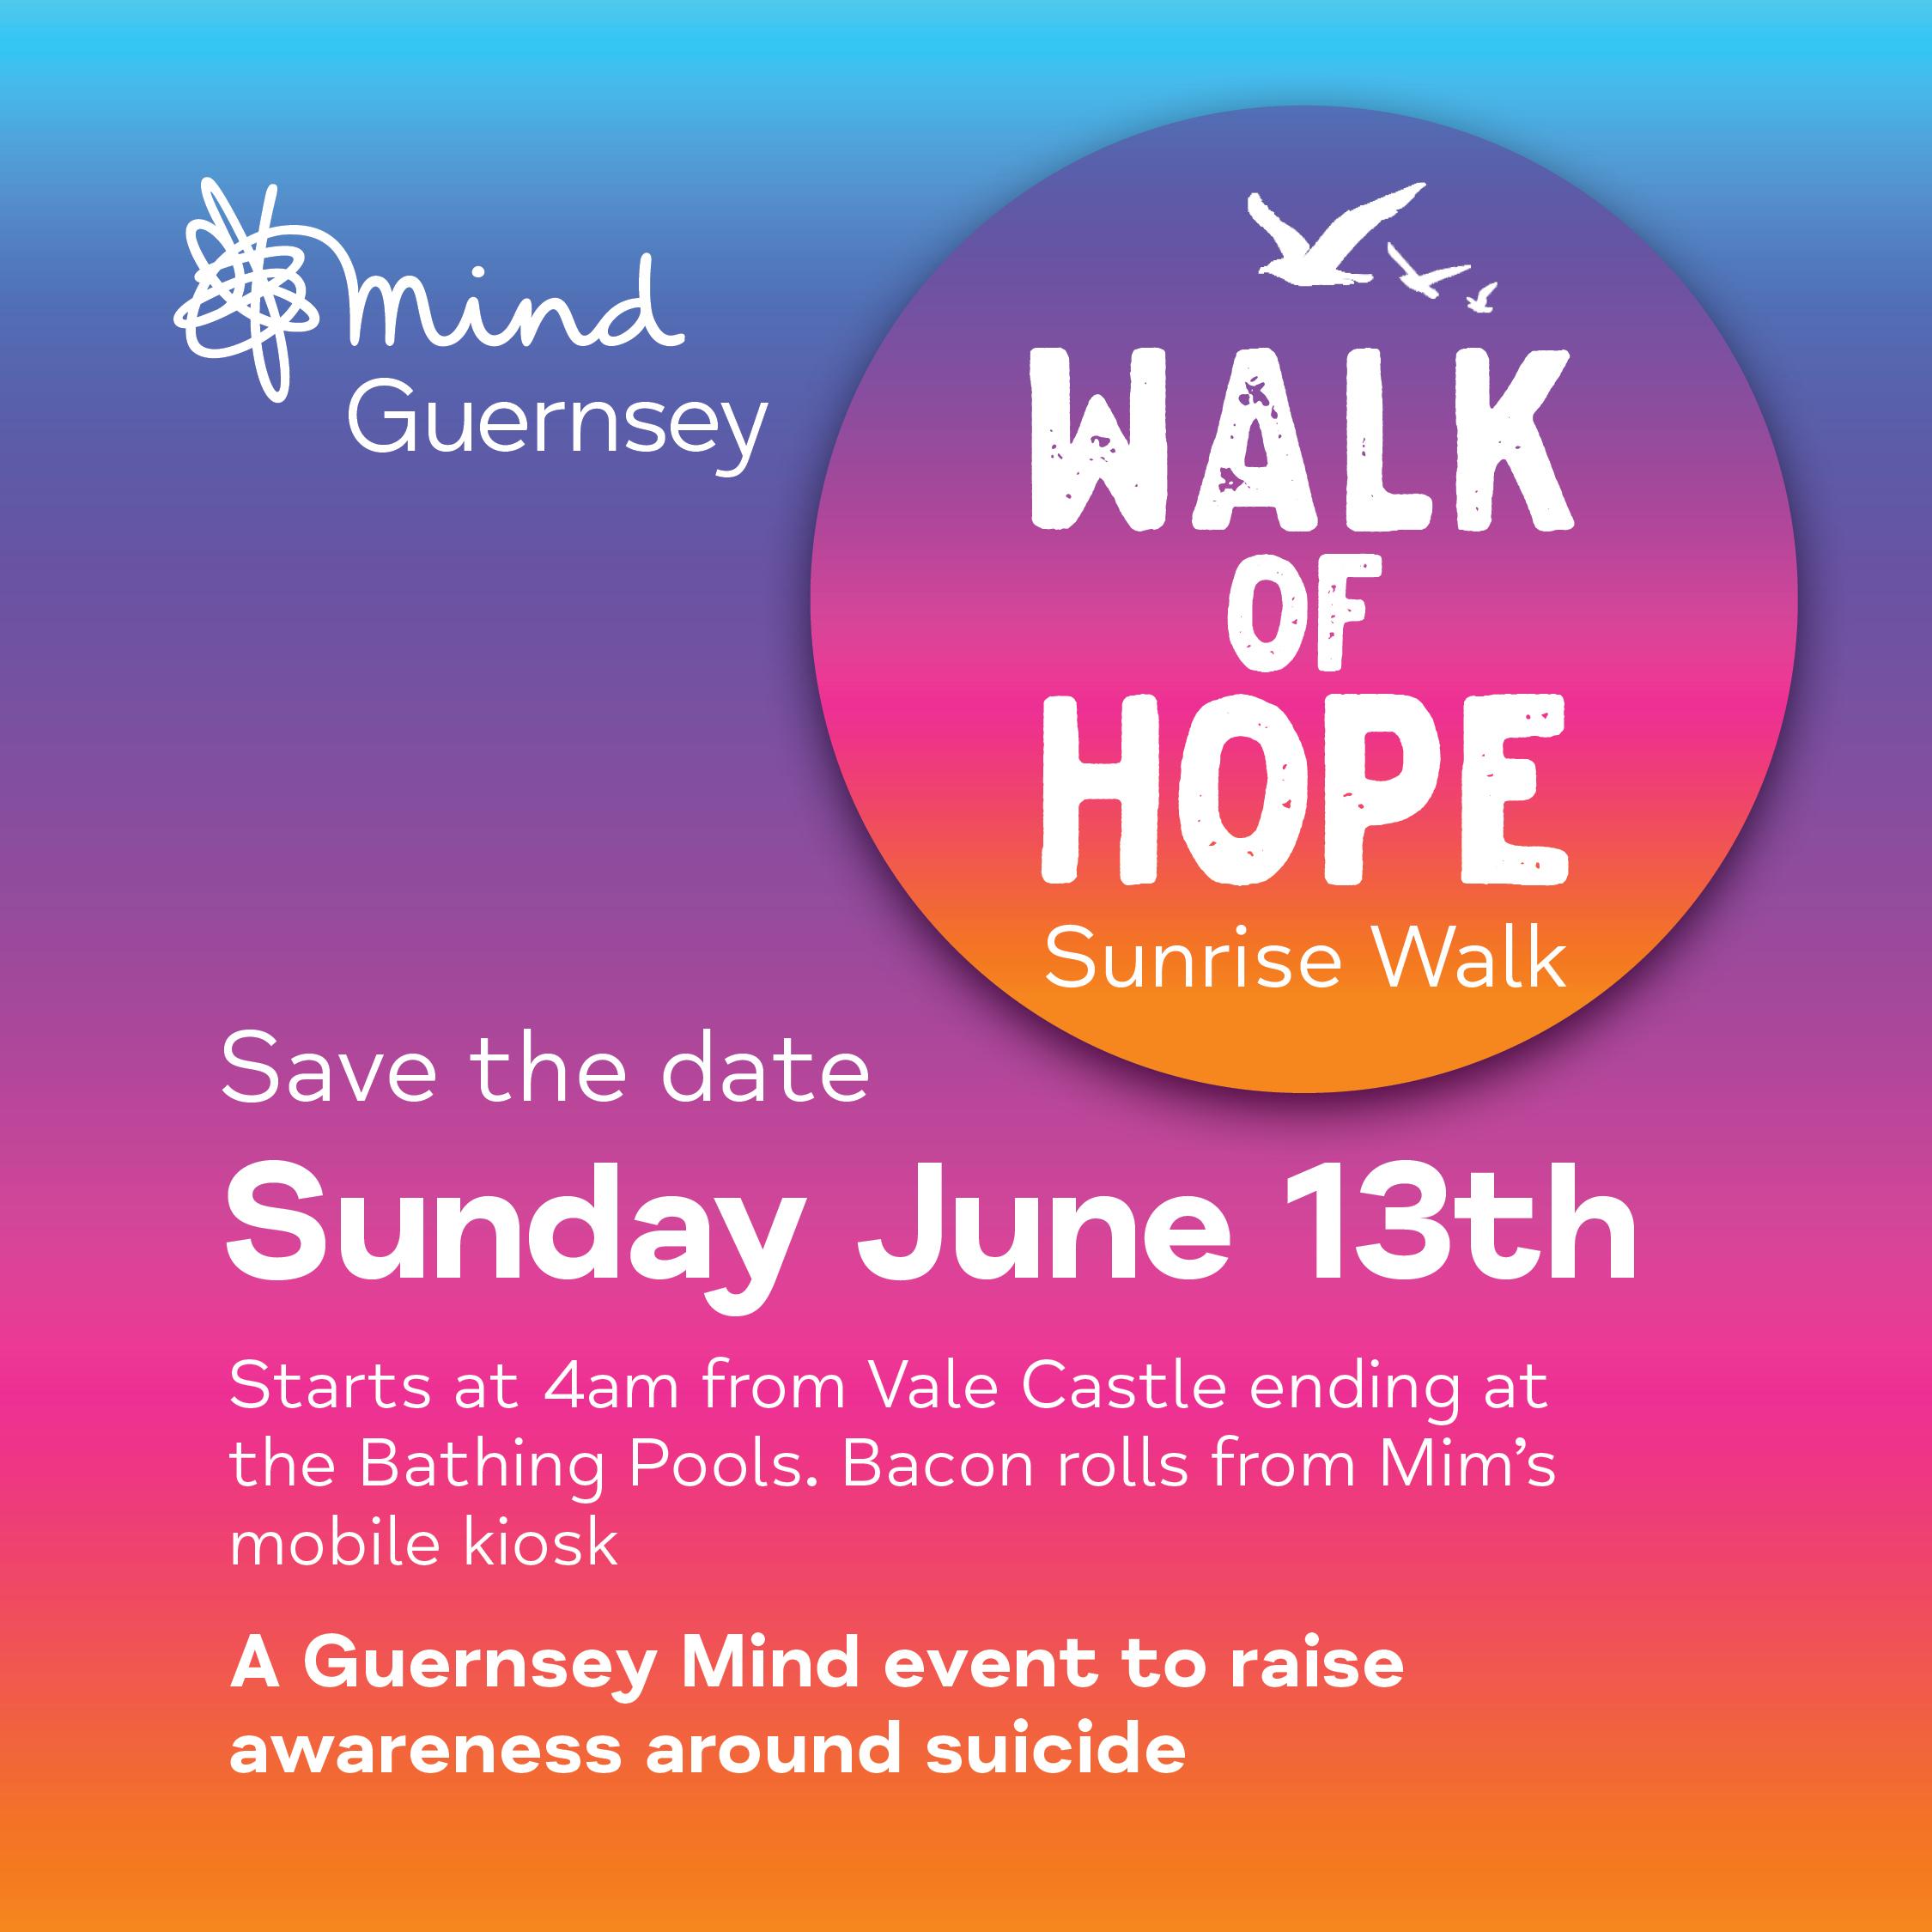 Walk of Hope - thank you!